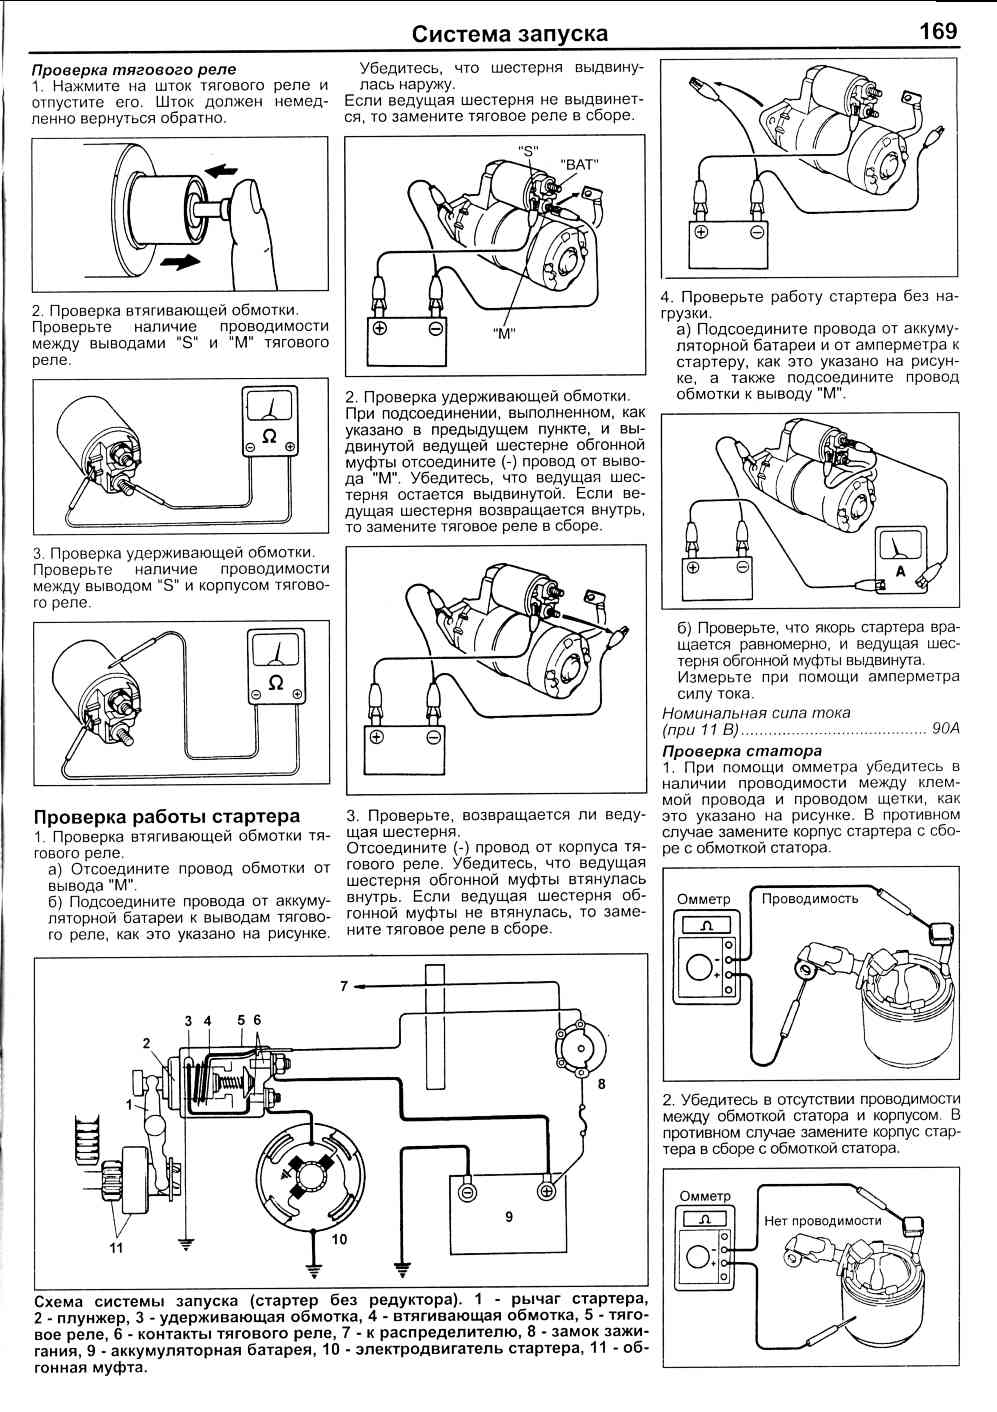 Фото №10 - ВАЗ 2110 как проверить стартер